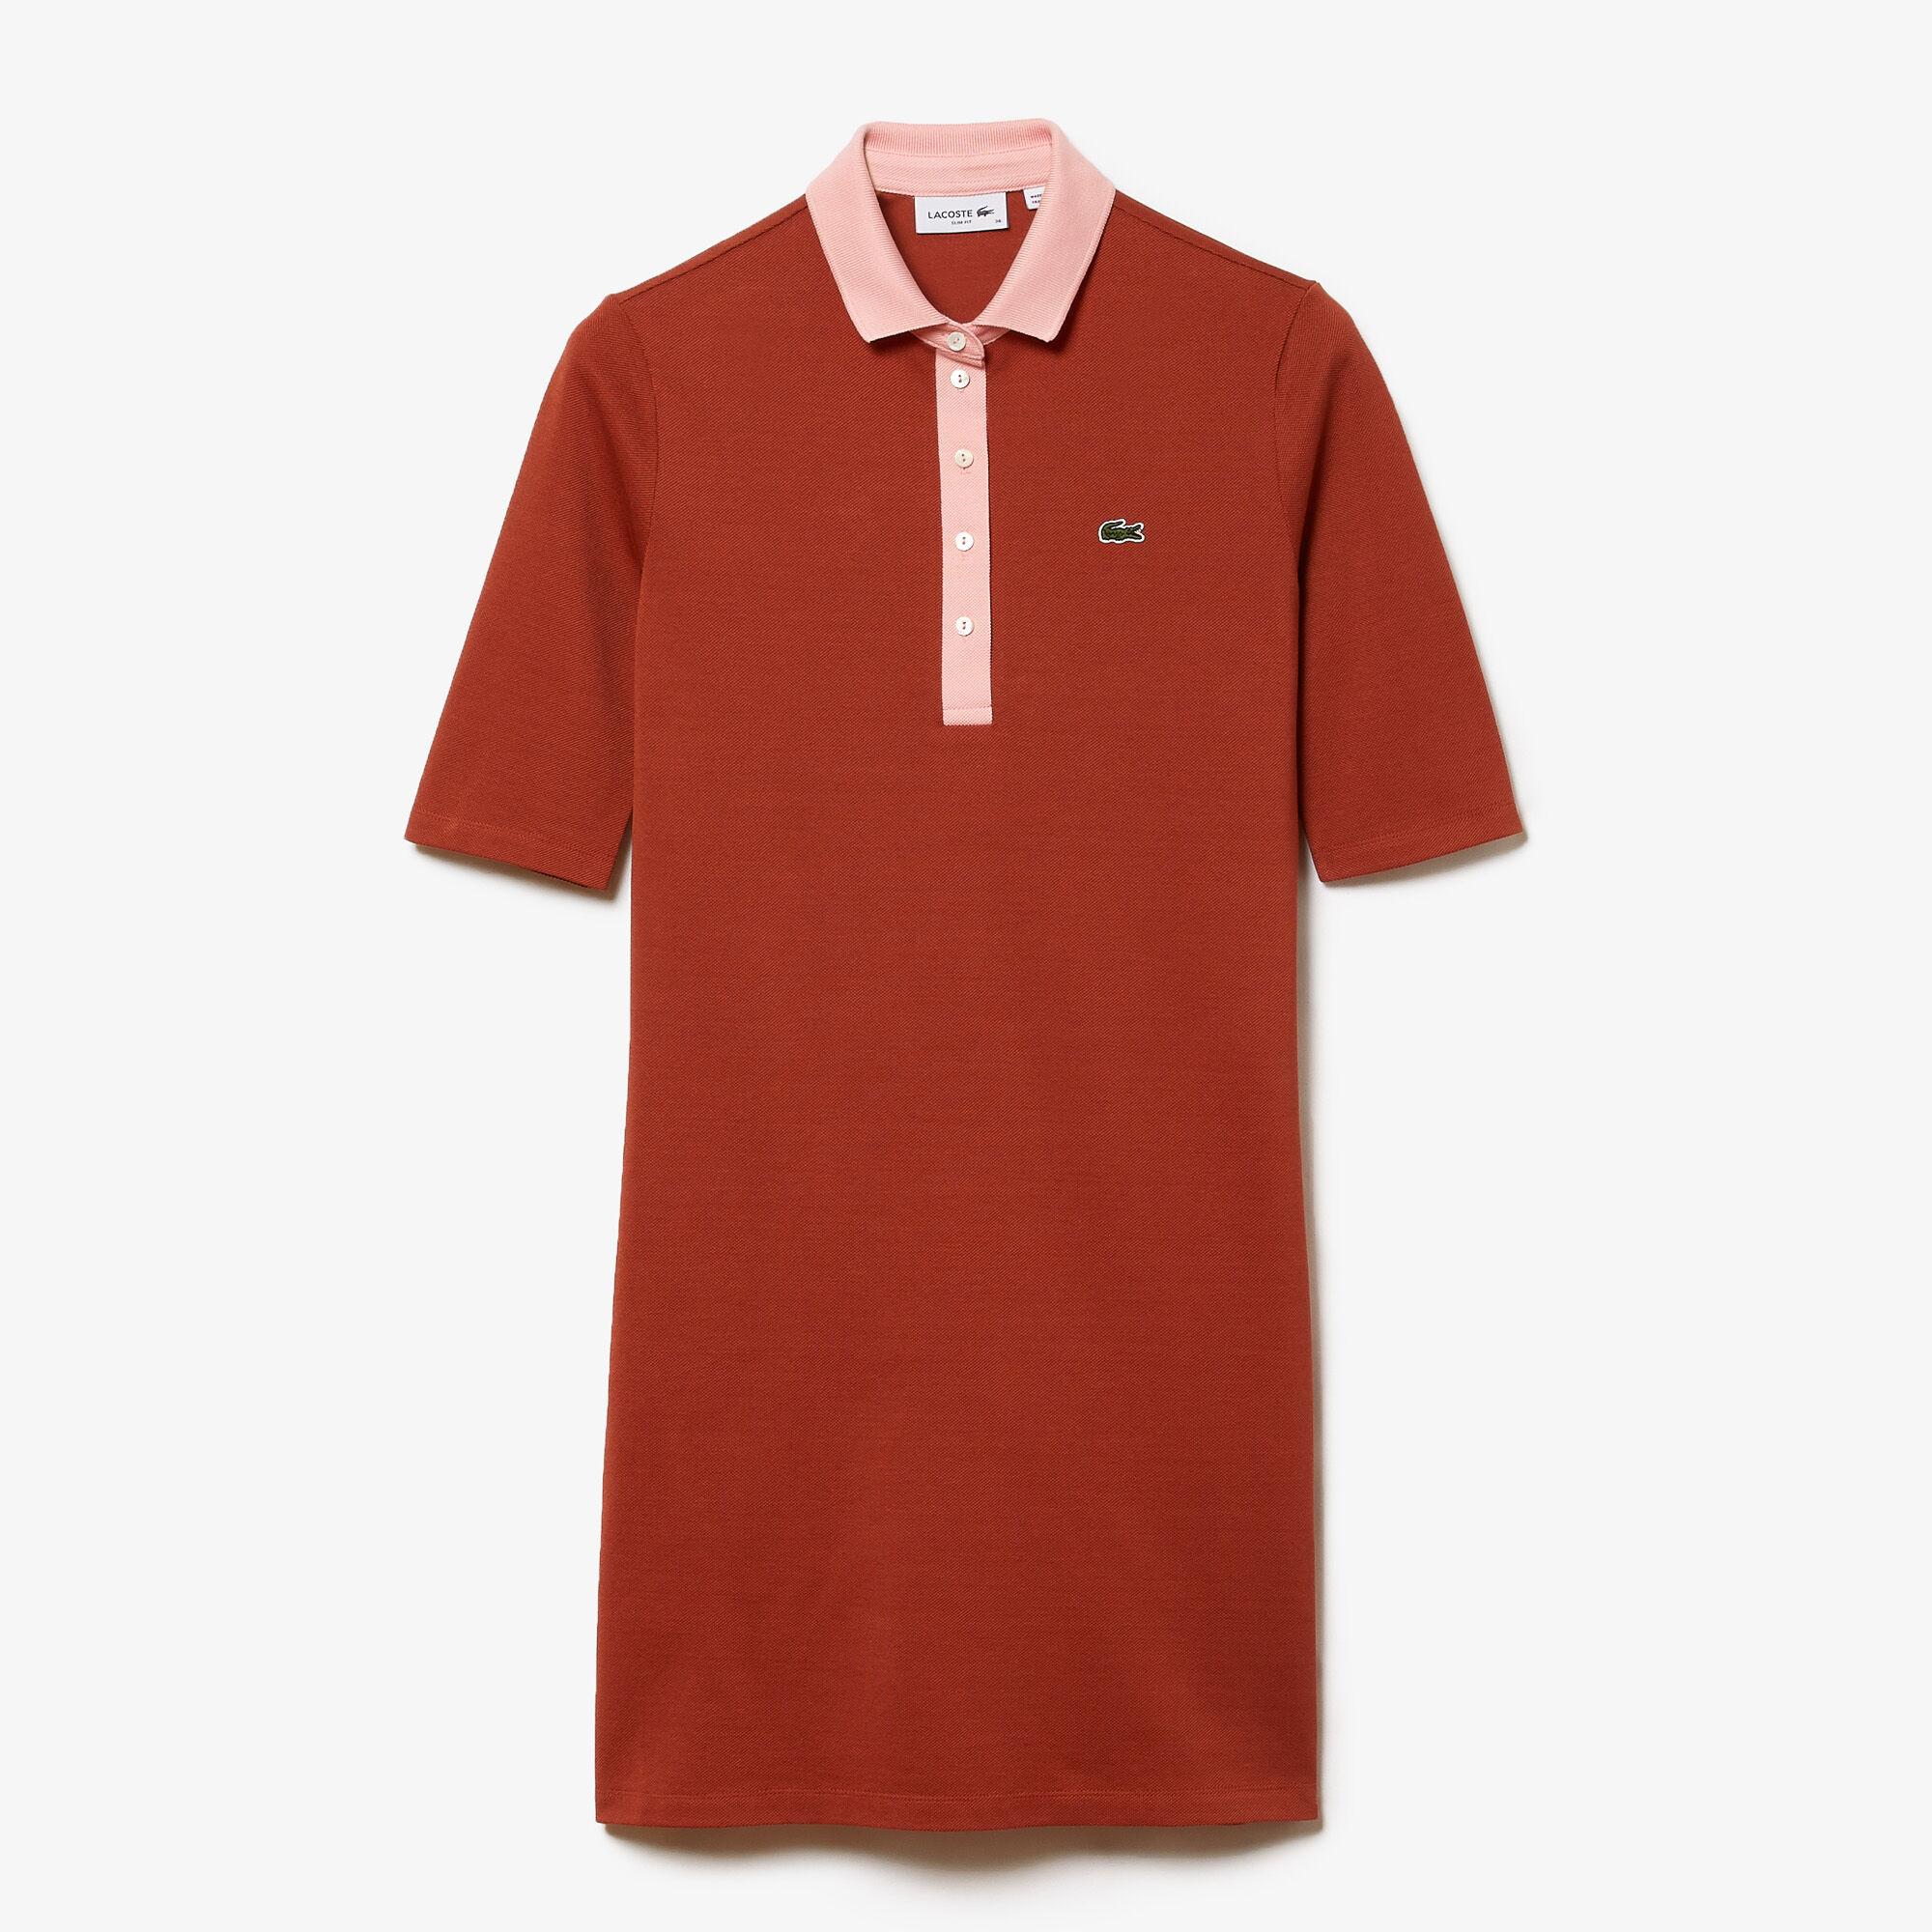 Women's Premium Cotton Piqué Polo Dress